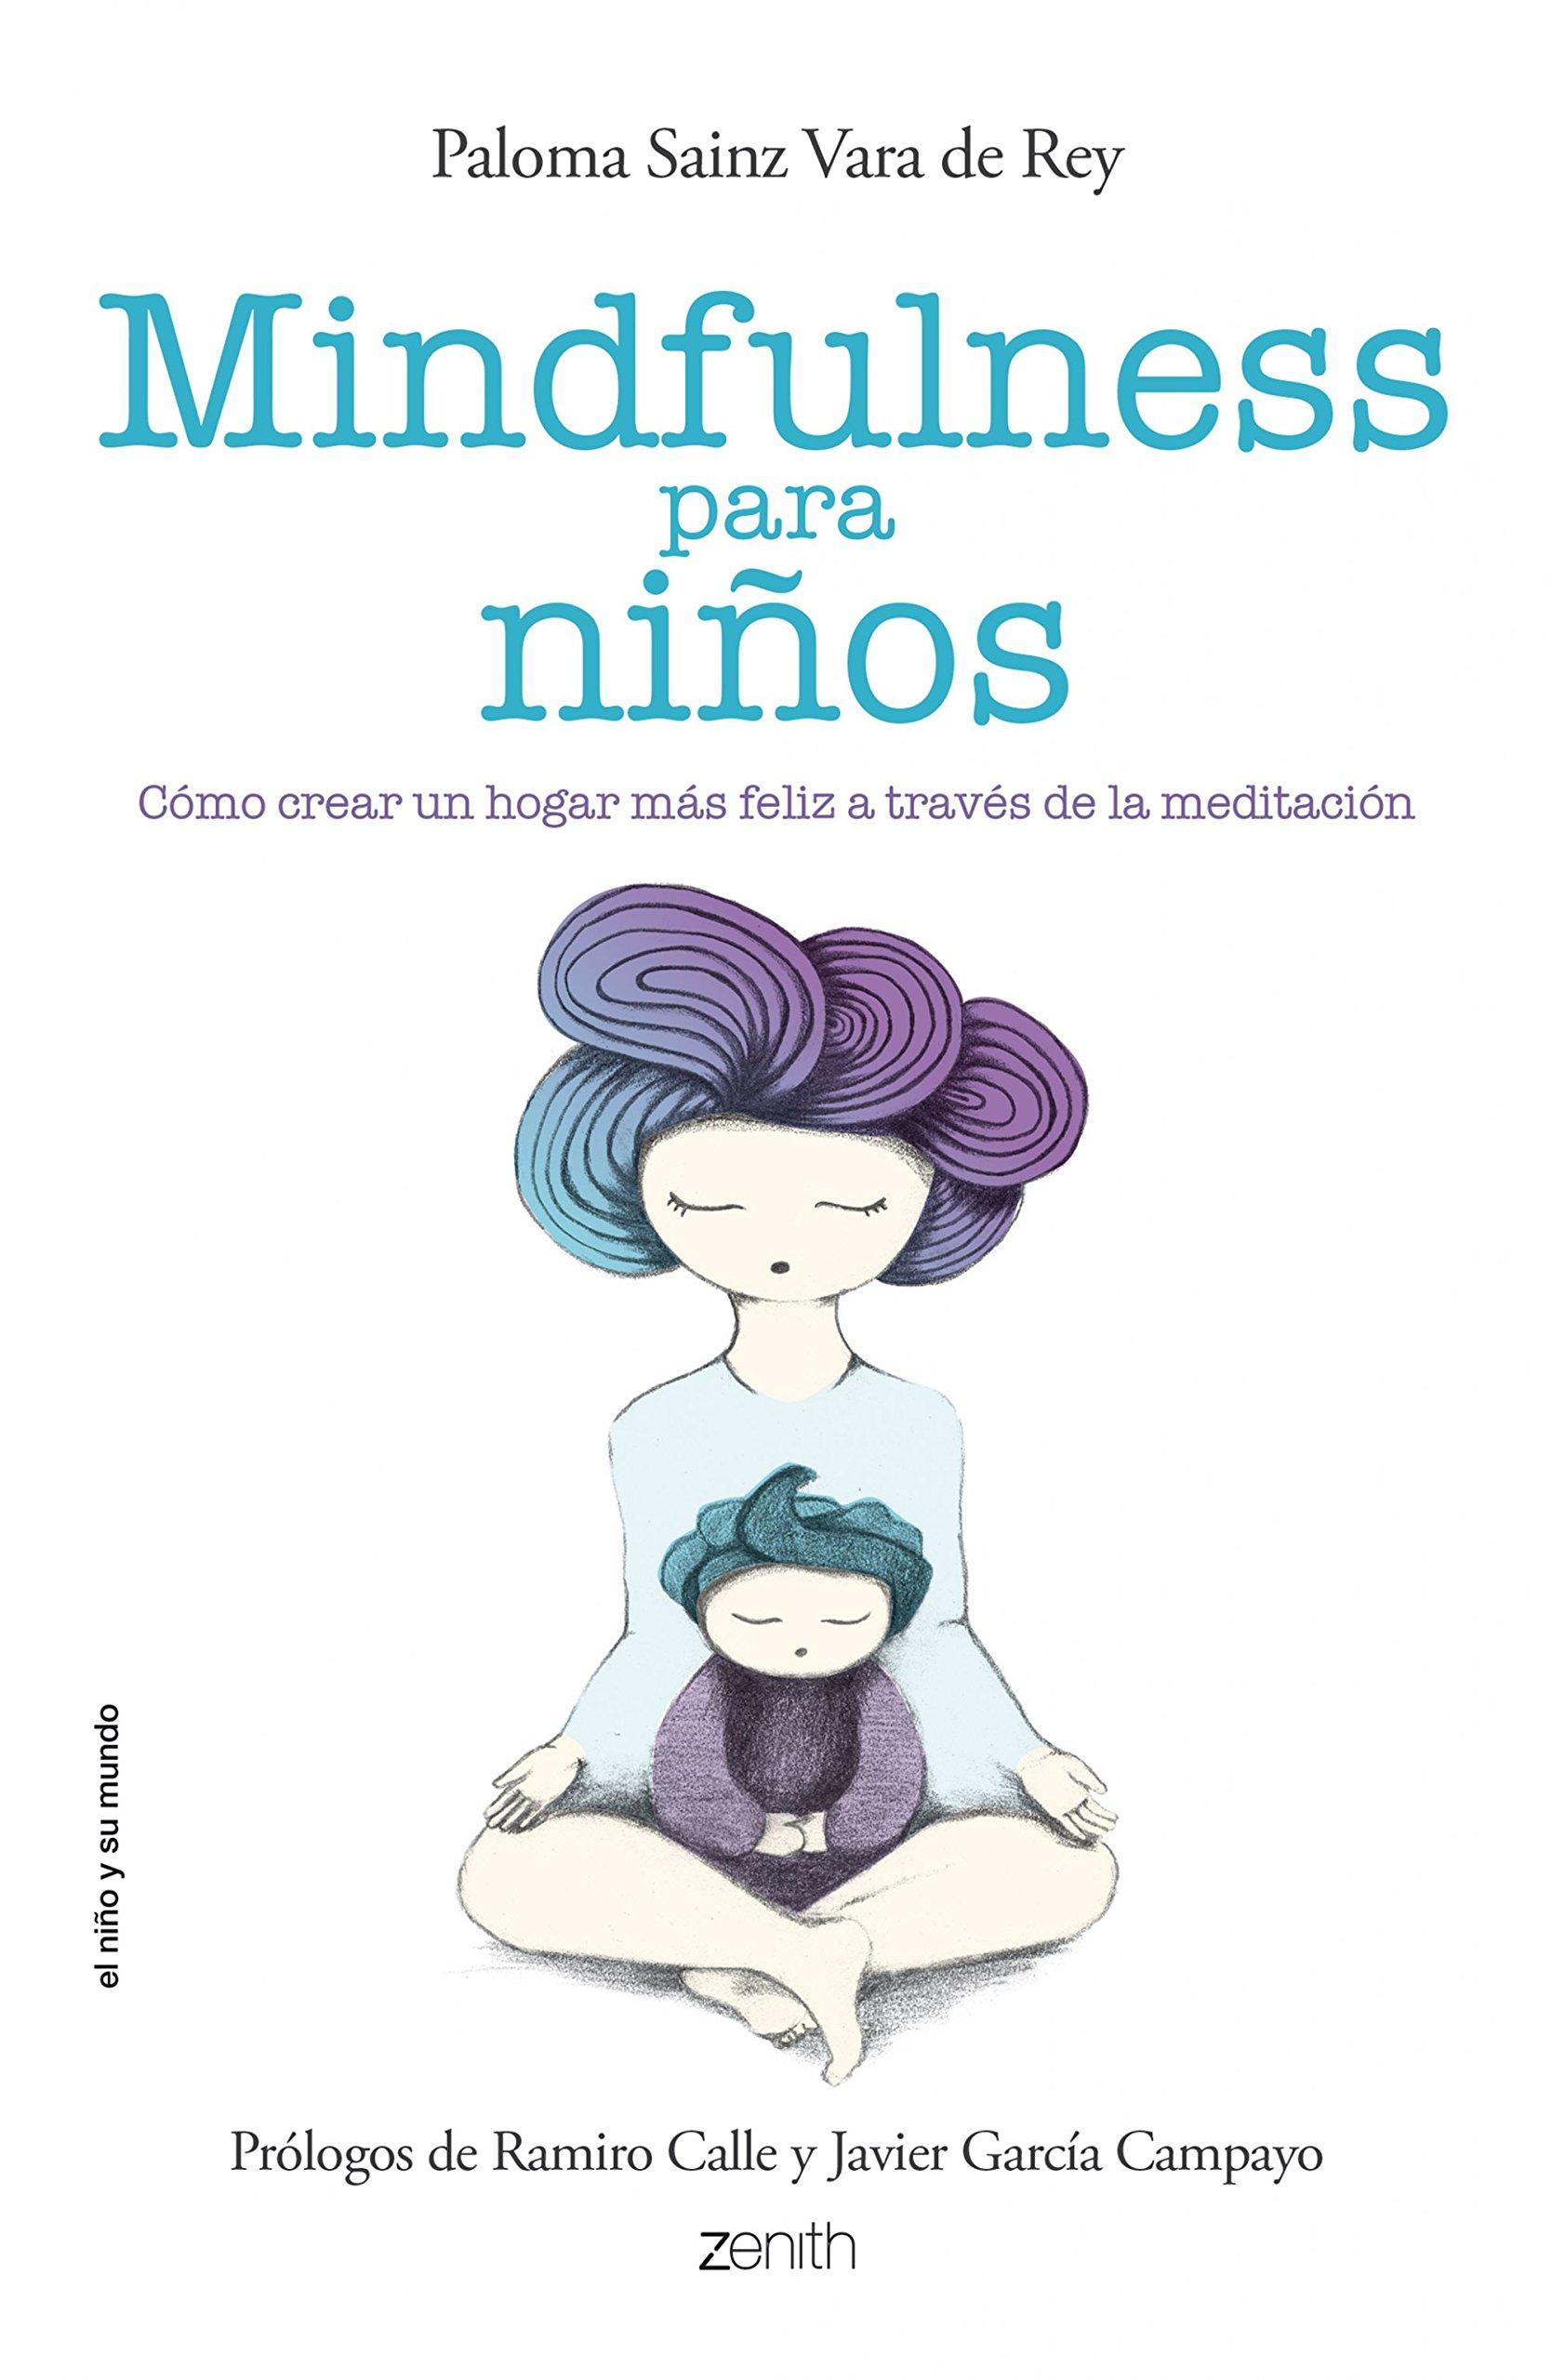 Mindfulness para niños (El Niño y su Mundo) Tapa blanda – 24 feb 2015 Zenith 8408136690 Budismo zen Child care & upbringing